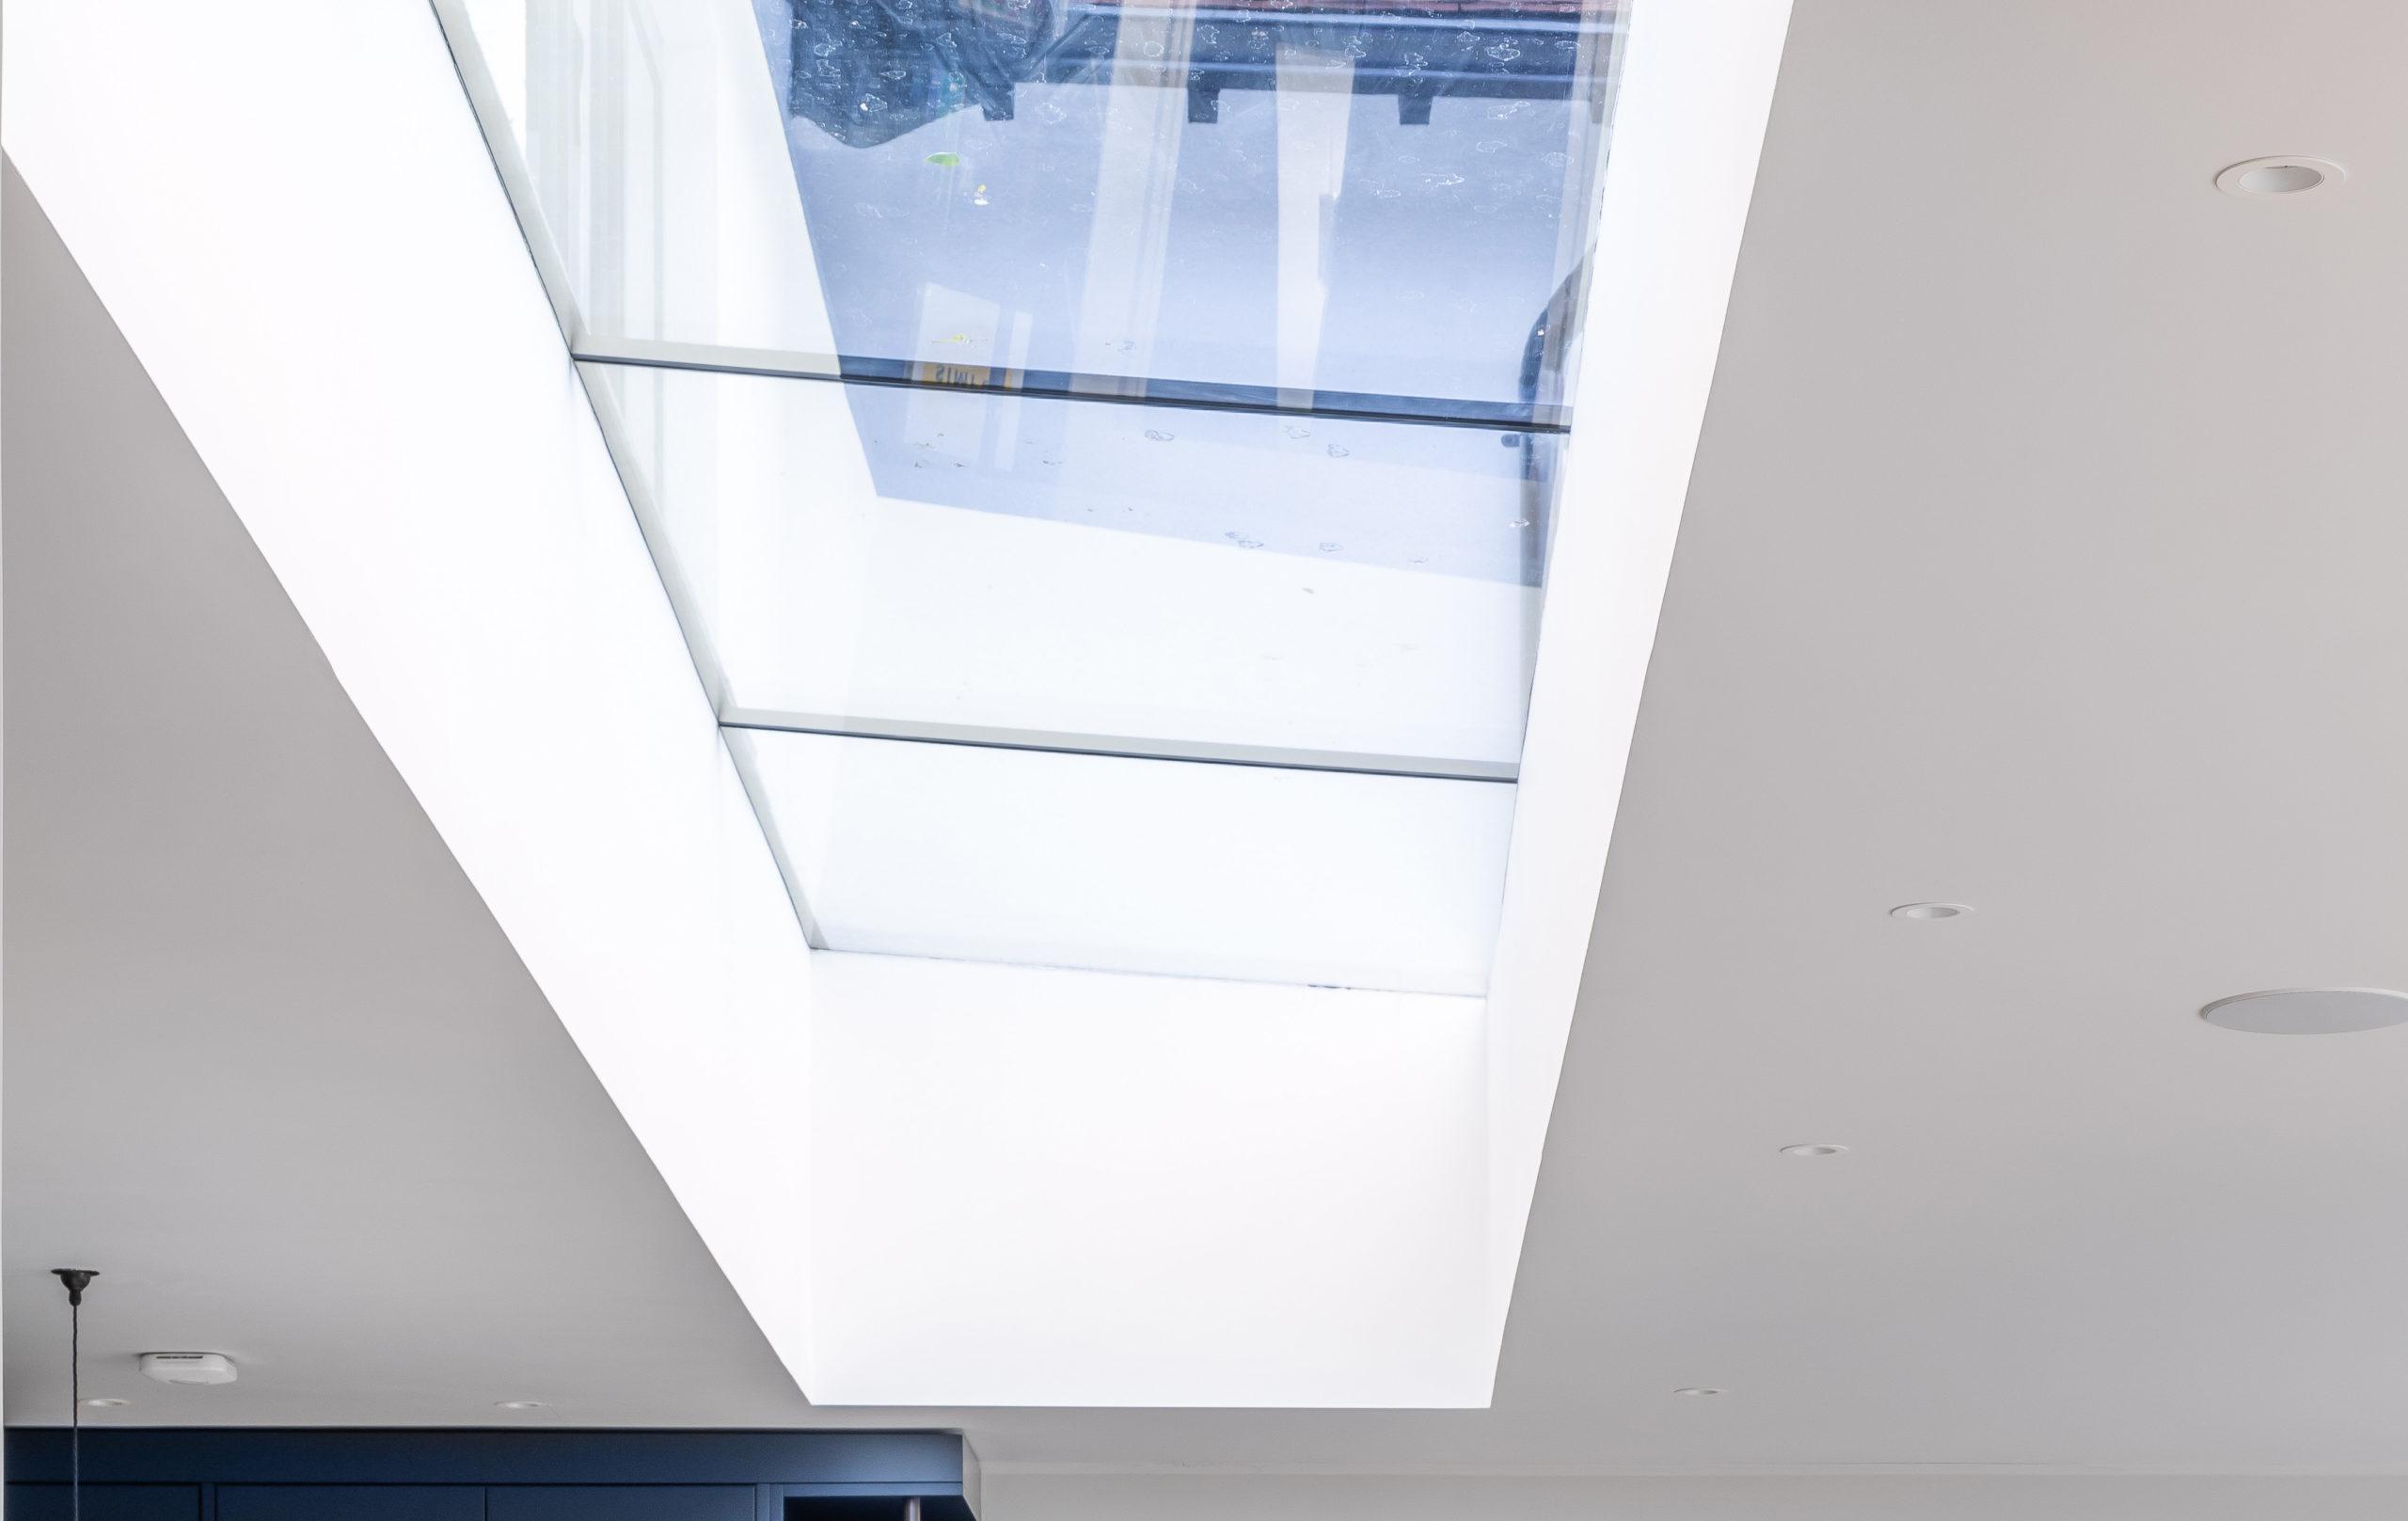 Chilterns-Hill-SL320-Rooflight-Fixed-Window_8